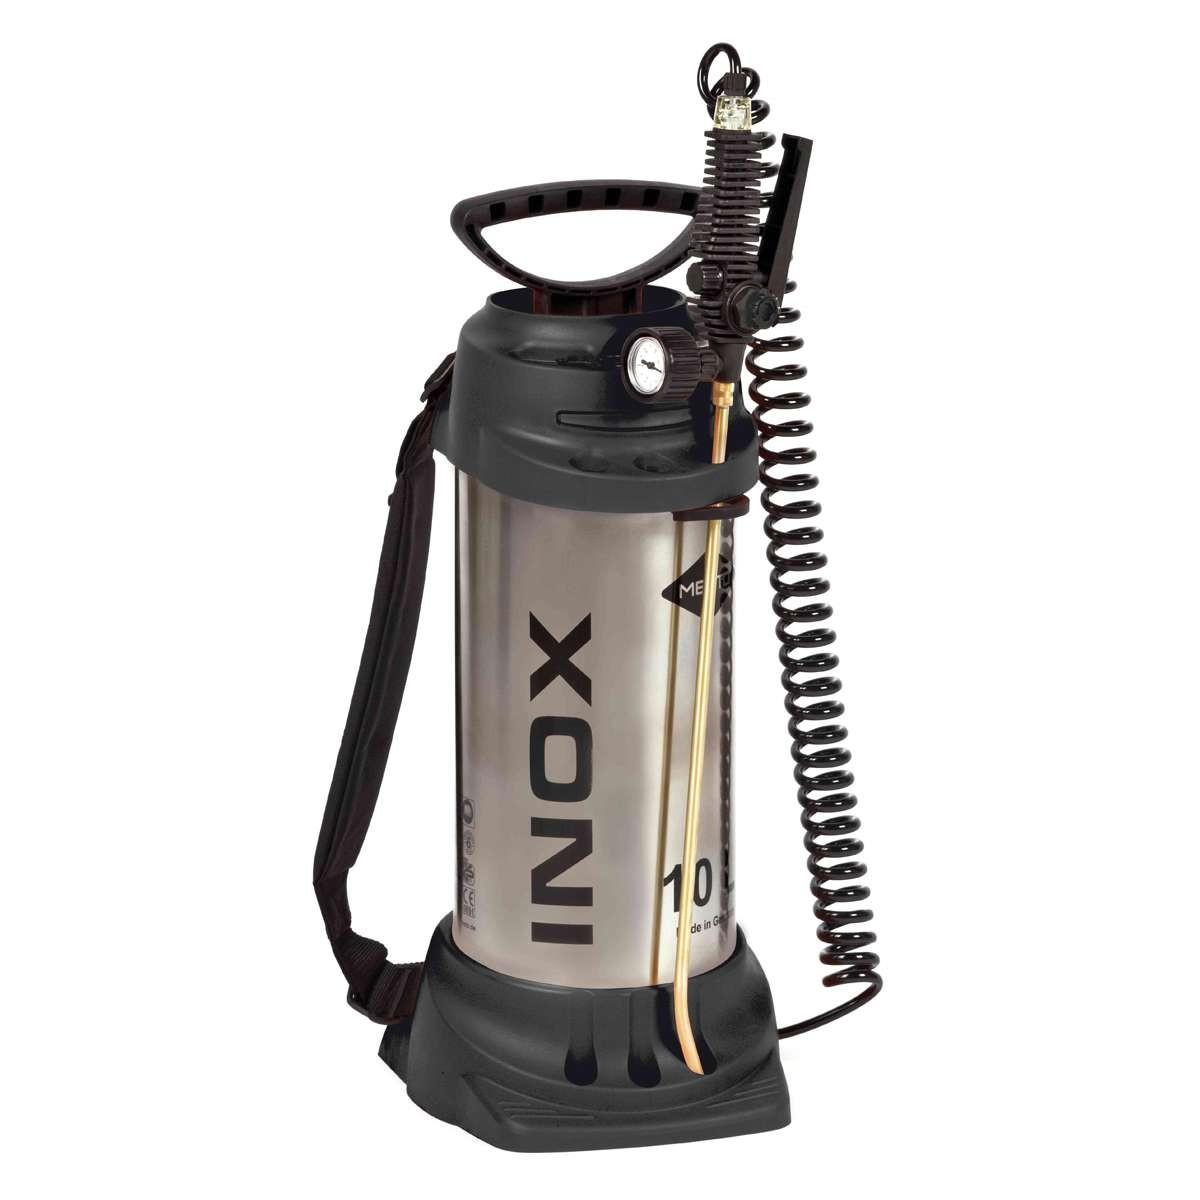 Mesto INOX 3615 - Füllinhalt: 10 l, ohne Dosicontrol